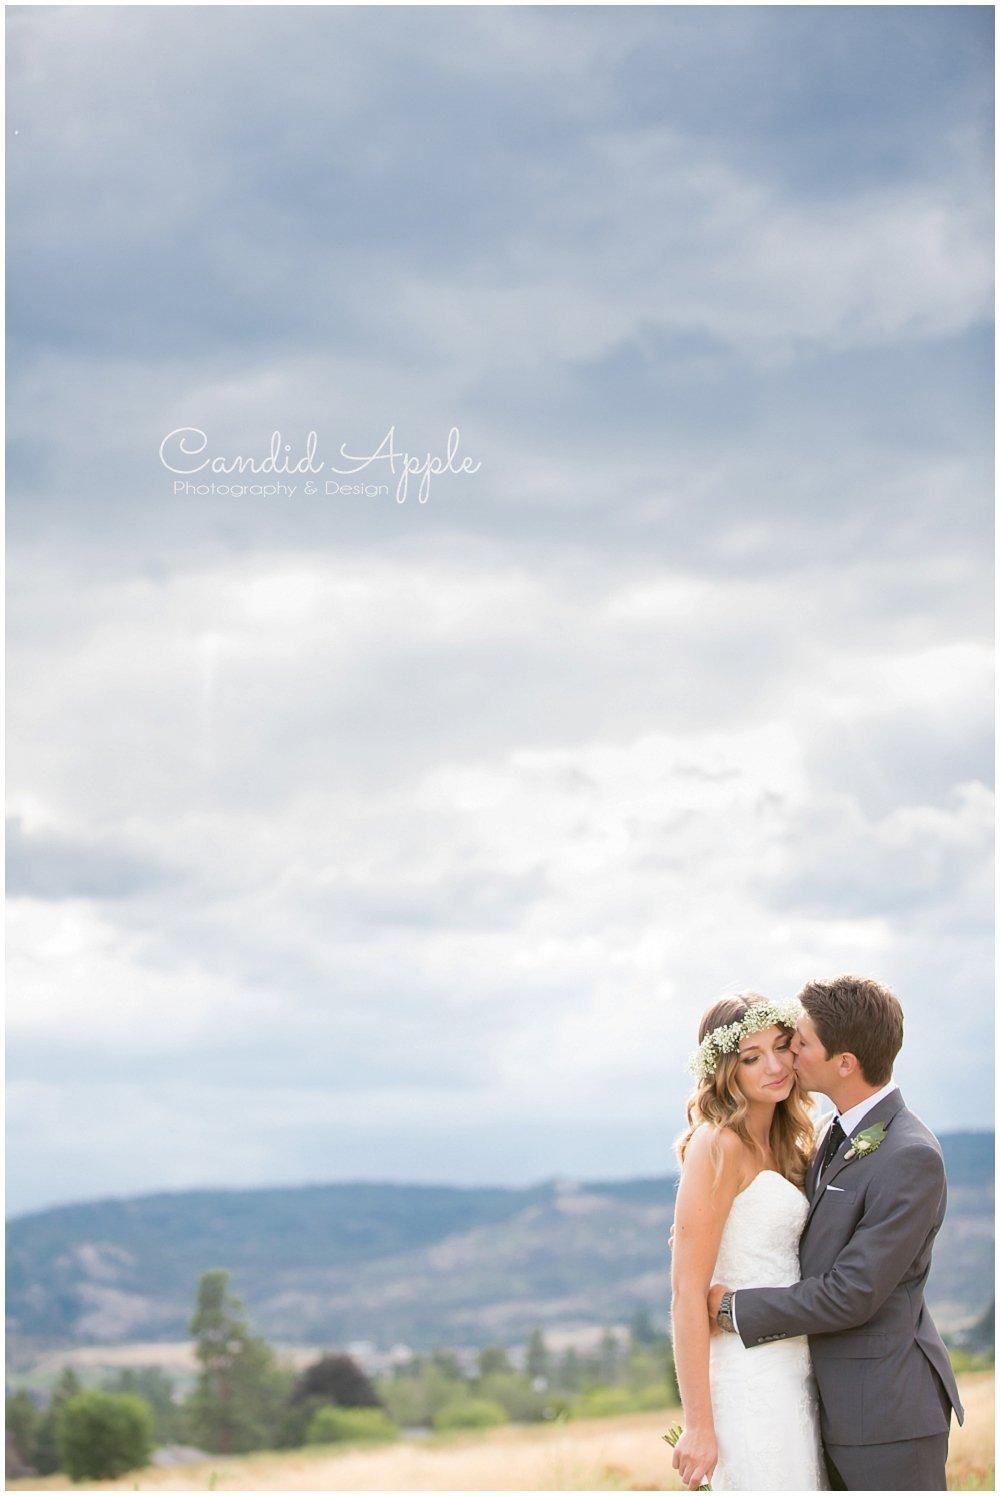 Sanctuary_Garden_West_Kelowna_Candid_Apple_Wedding_Photography_0061